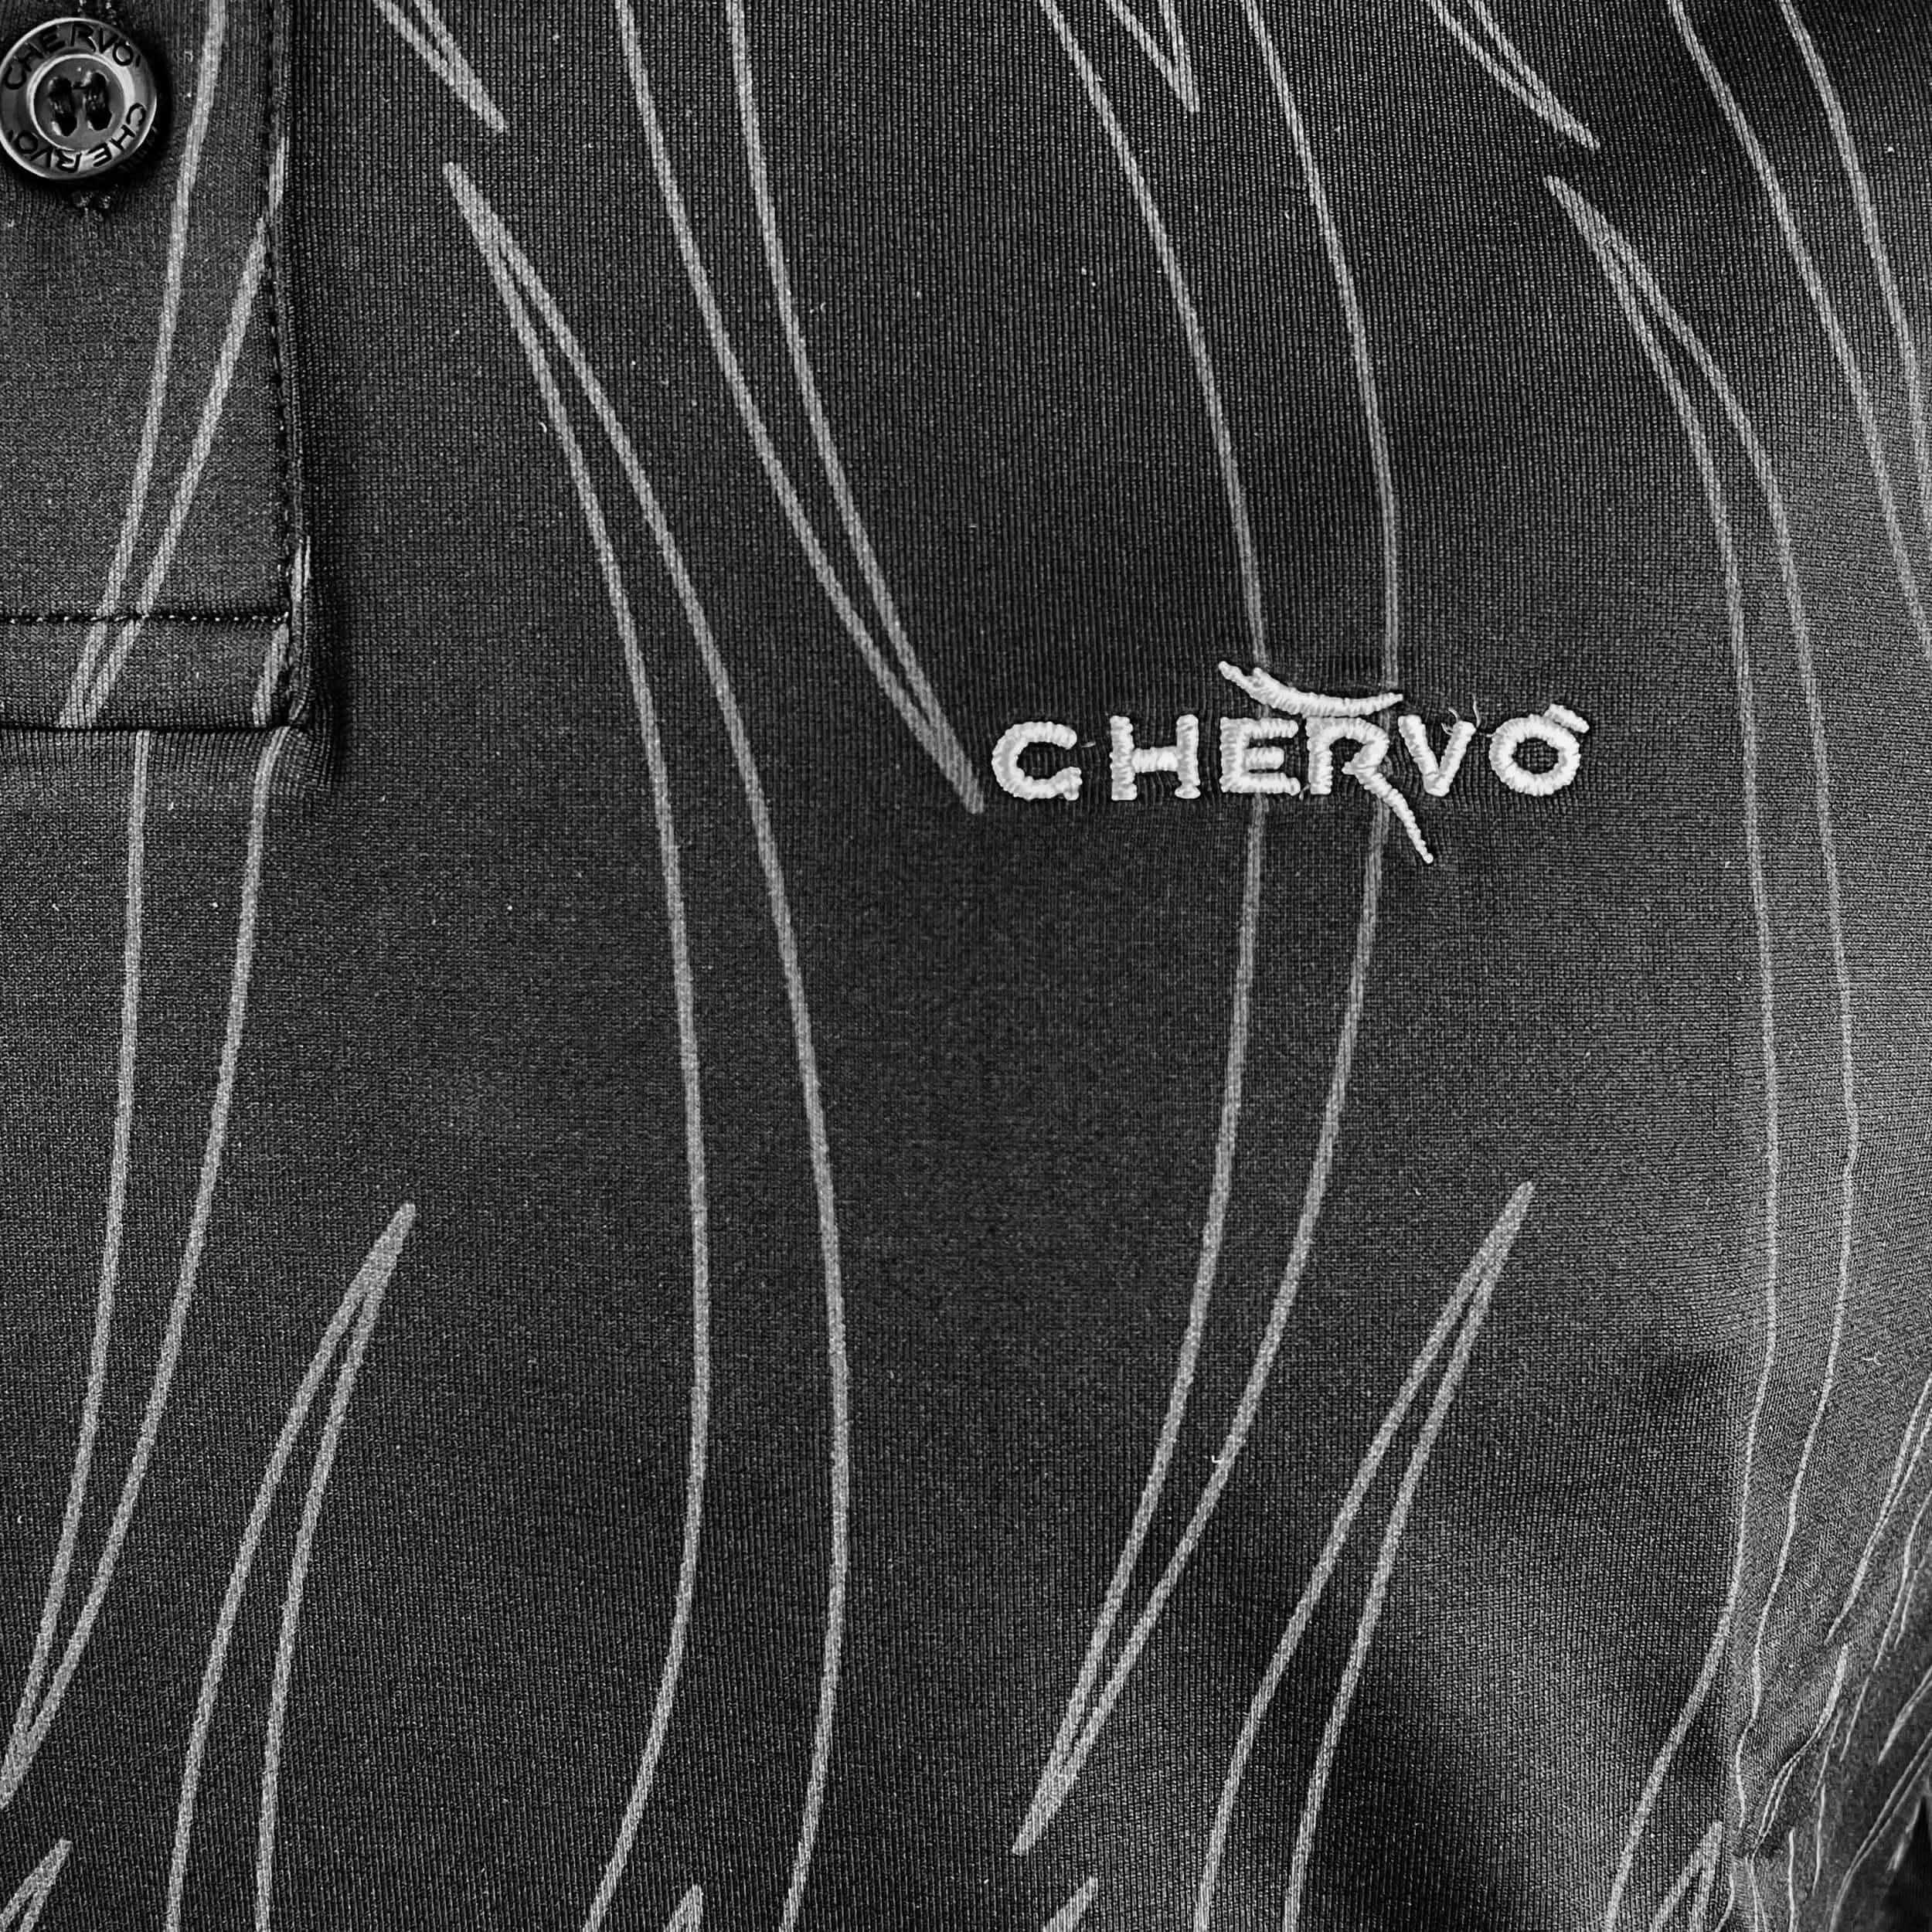 Chervo Herren Polo Aut DRY MATIC schwarz gemustert 99L